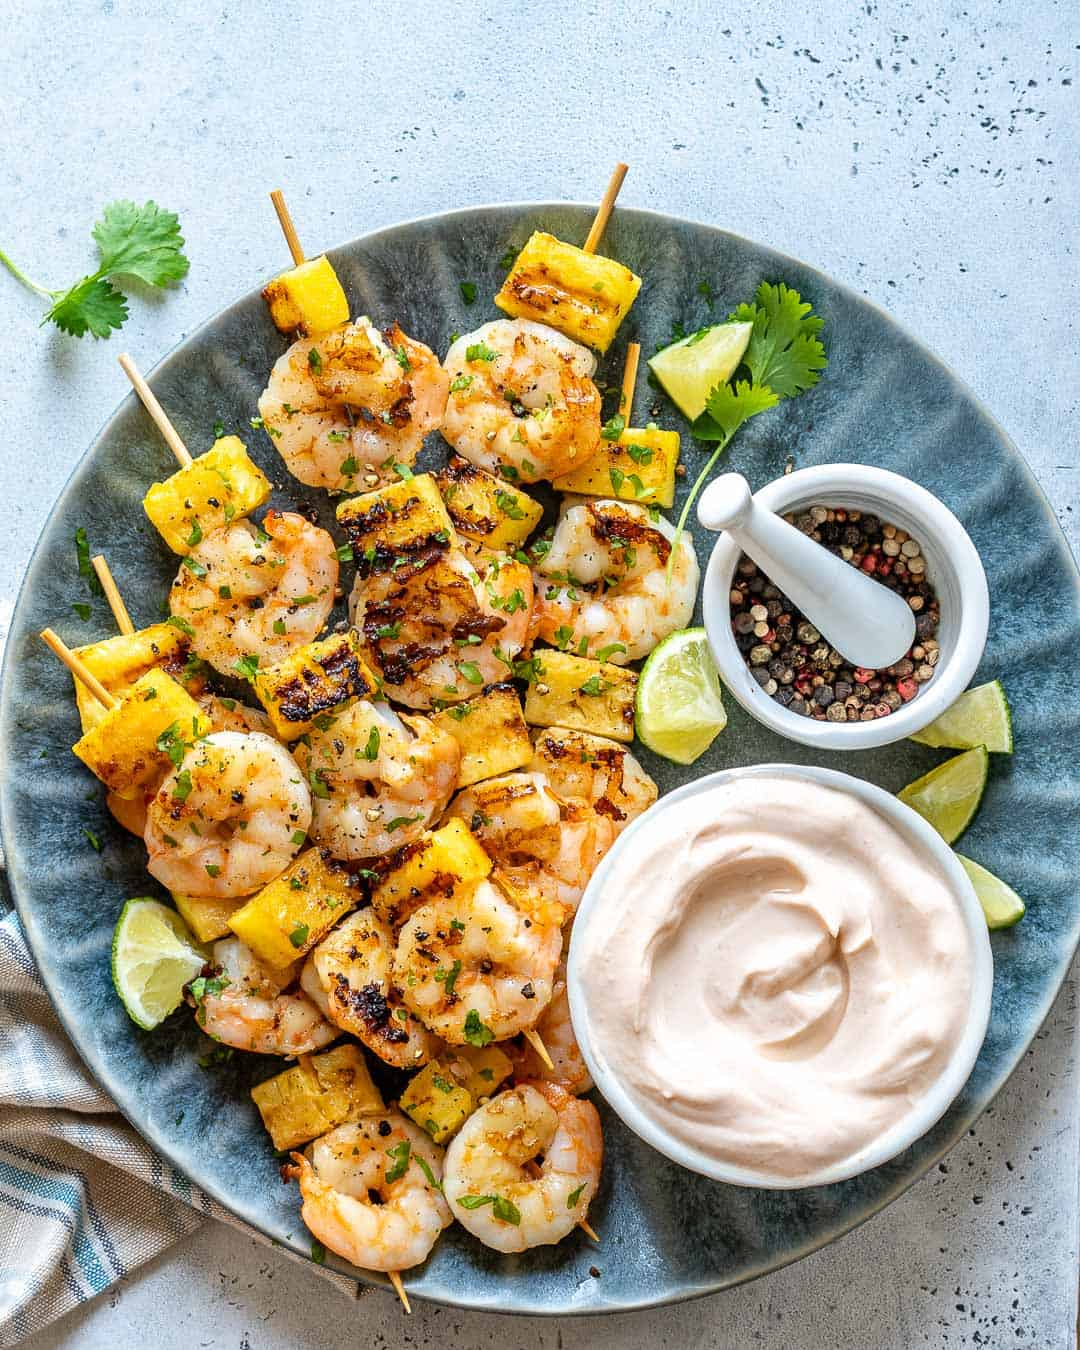 grille shrimp on blue plate with coconut yogurt dip